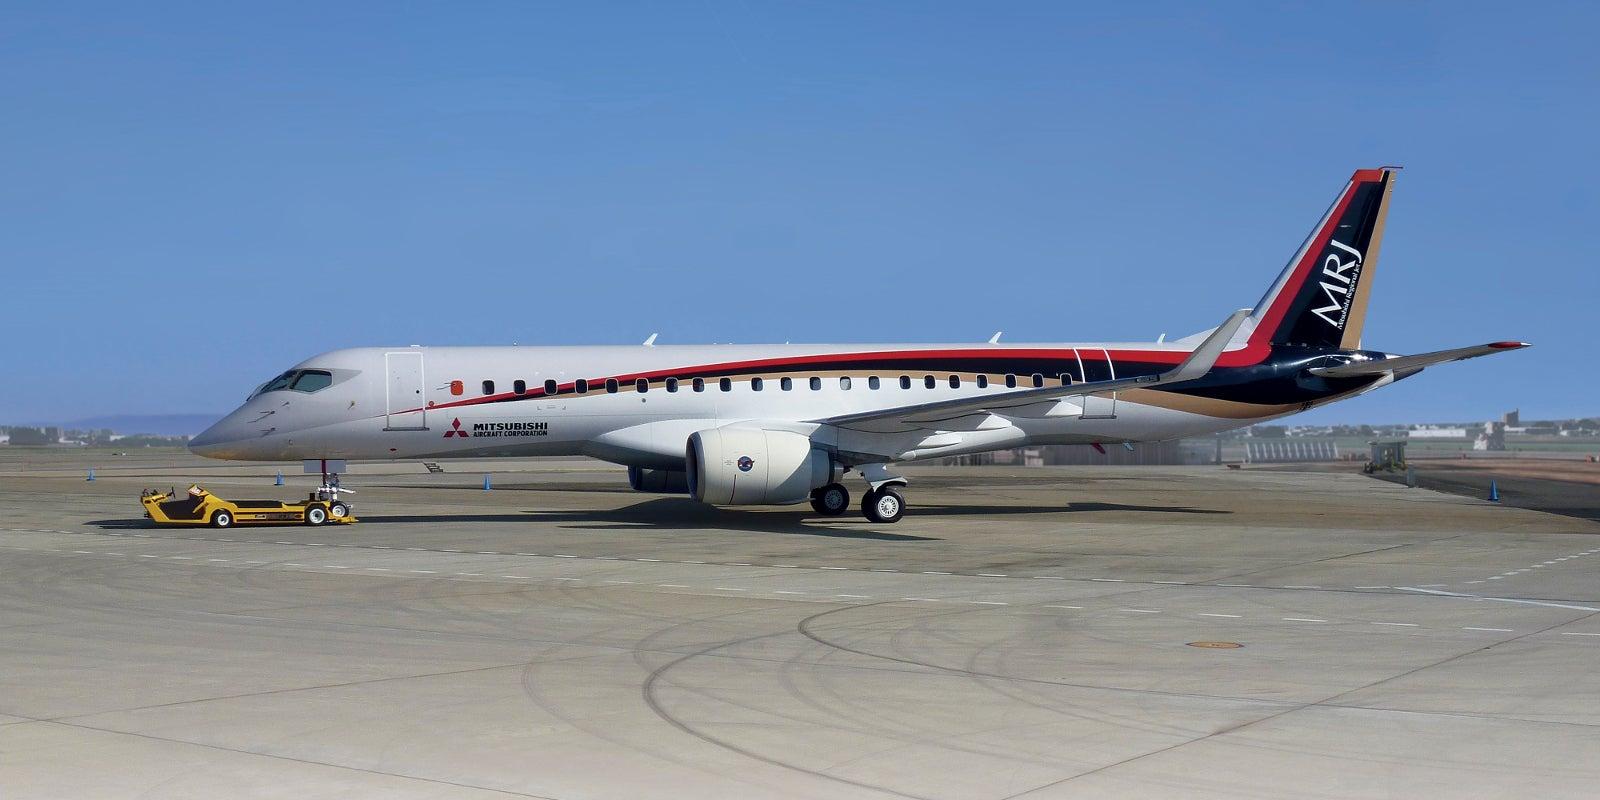 Japan's First Ever Passenger Jet Just Took Its Maiden Flight